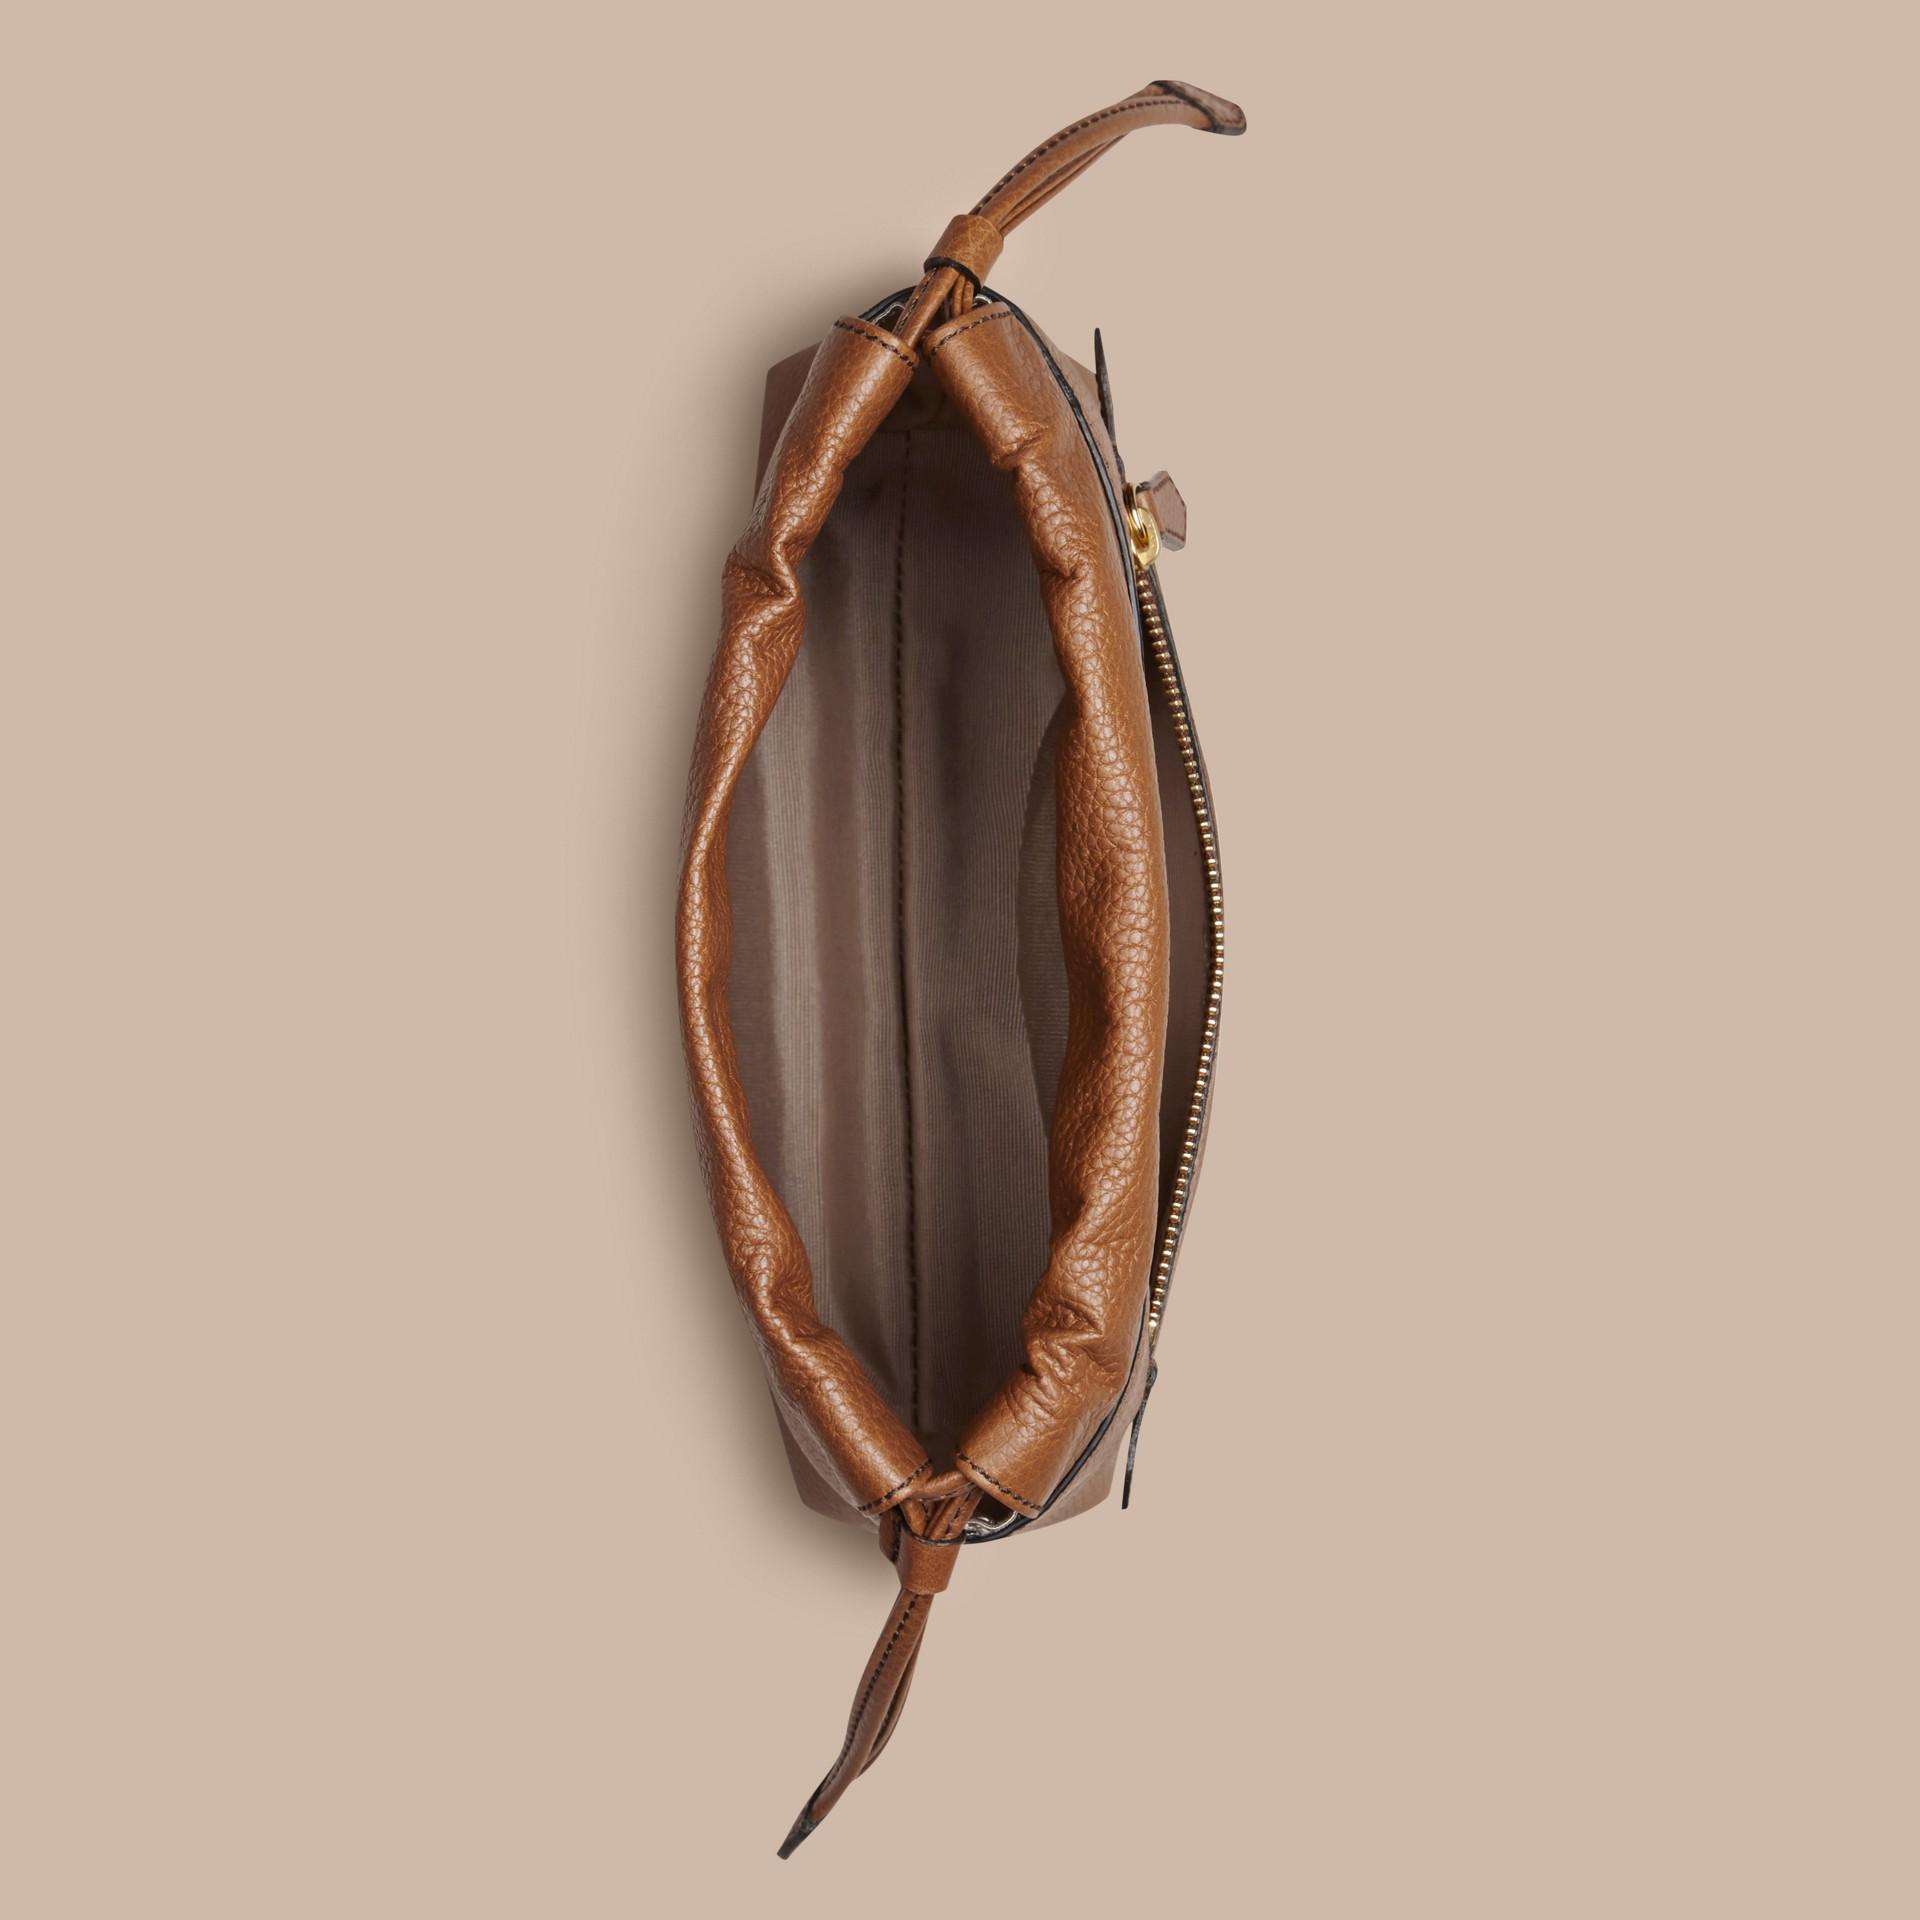 Hâle Sac The Mini Crush en cuir grené Hâle - photo de la galerie 2